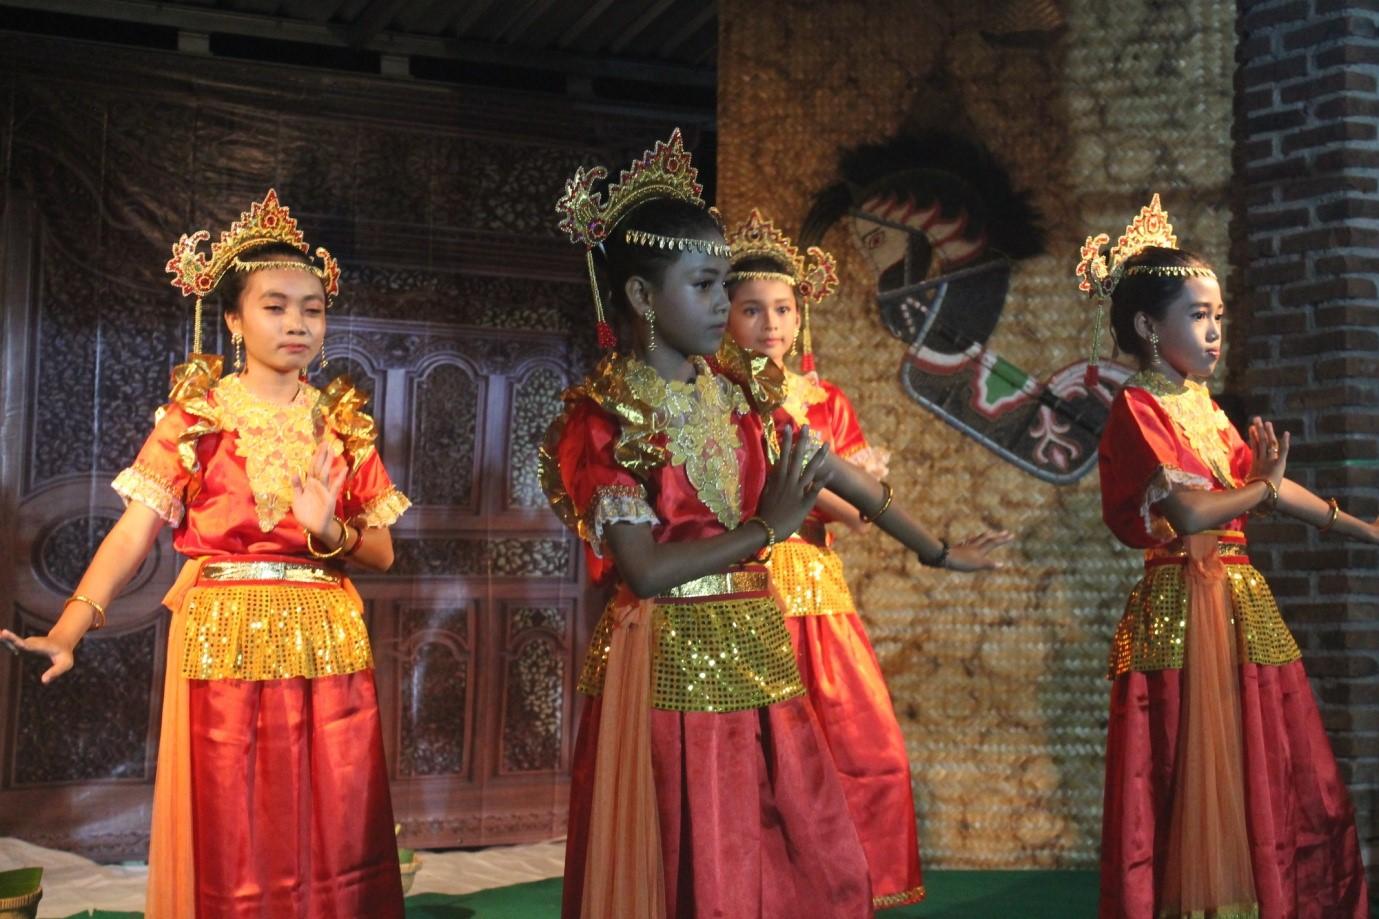 Membangkitkan Potensi Kesenian Melalui Program Festival Desa Keji